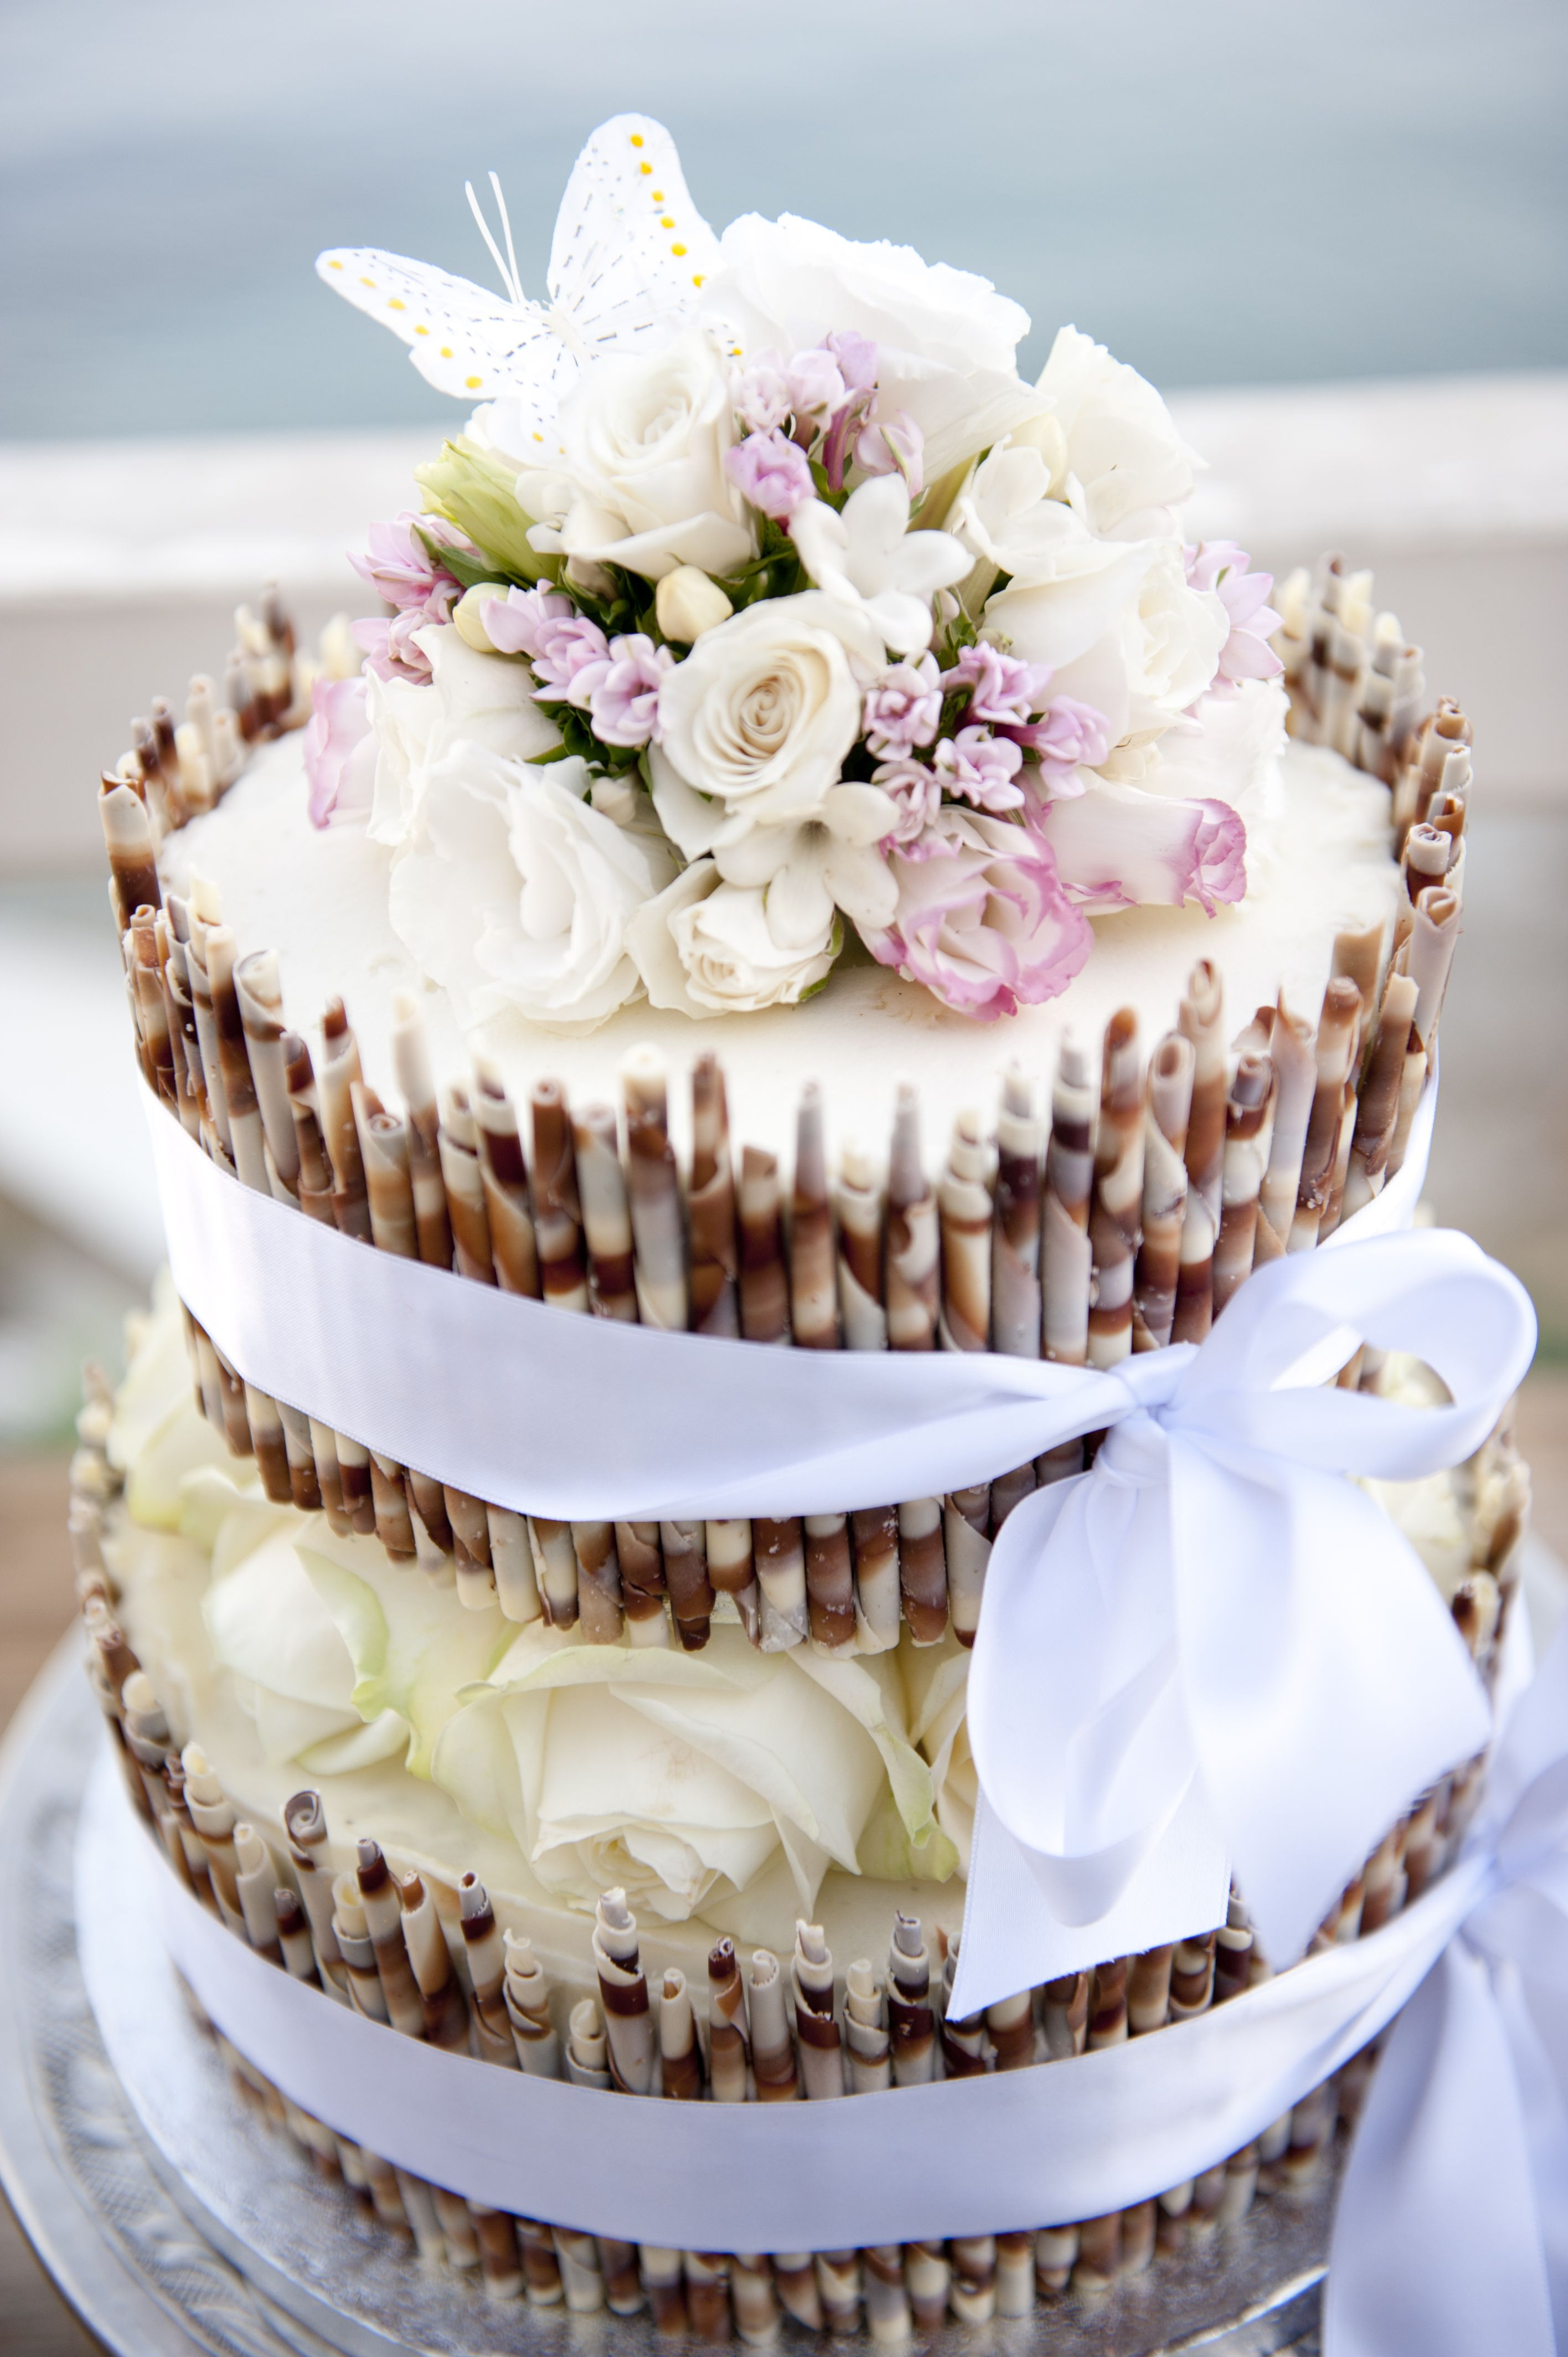 Serene Chocolate Cheesecake Wedding Cake A Spring Wedding Cheesecake Wedding Cake Cheesecake Wedding Cake Frosting Recipe A Spring Wedding More Chocolate Cheesecake Wedding Cake